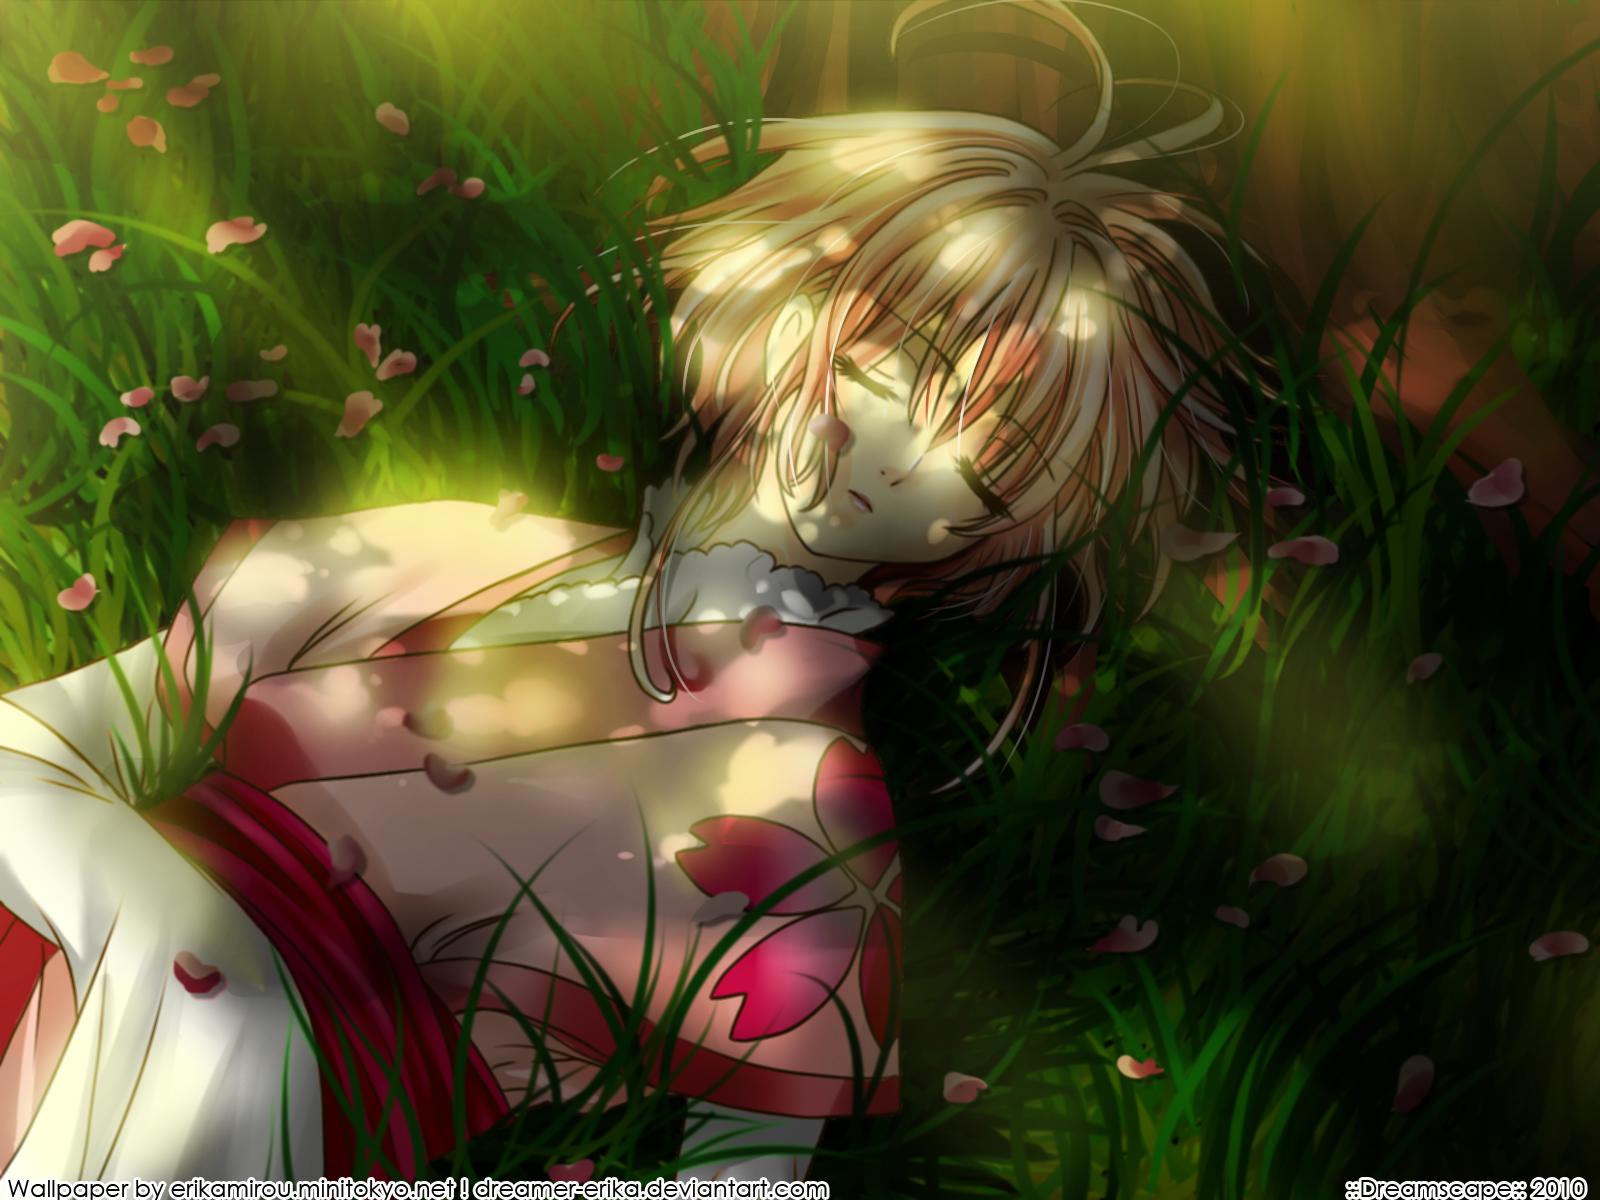 blonde_hair flowers grass japanese_clothes kimono petals sakura_(tsubasa) short_hair sleeping tsubasa_reservoir_chronicle